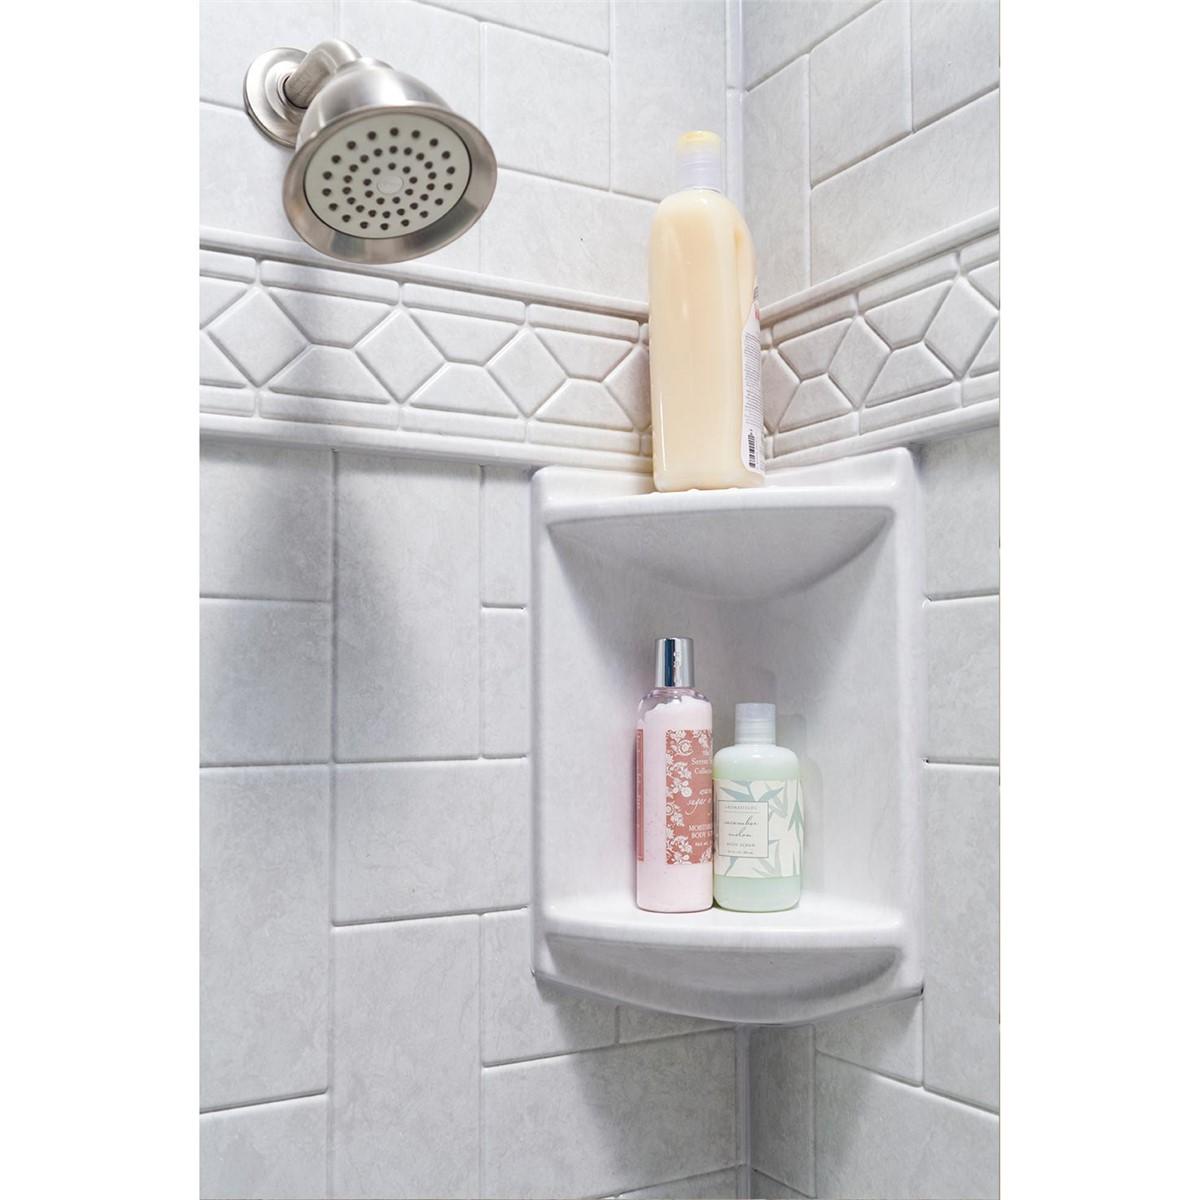 Bath & Shower Accessories | Bath Remodeling Accessories | Bath Planet